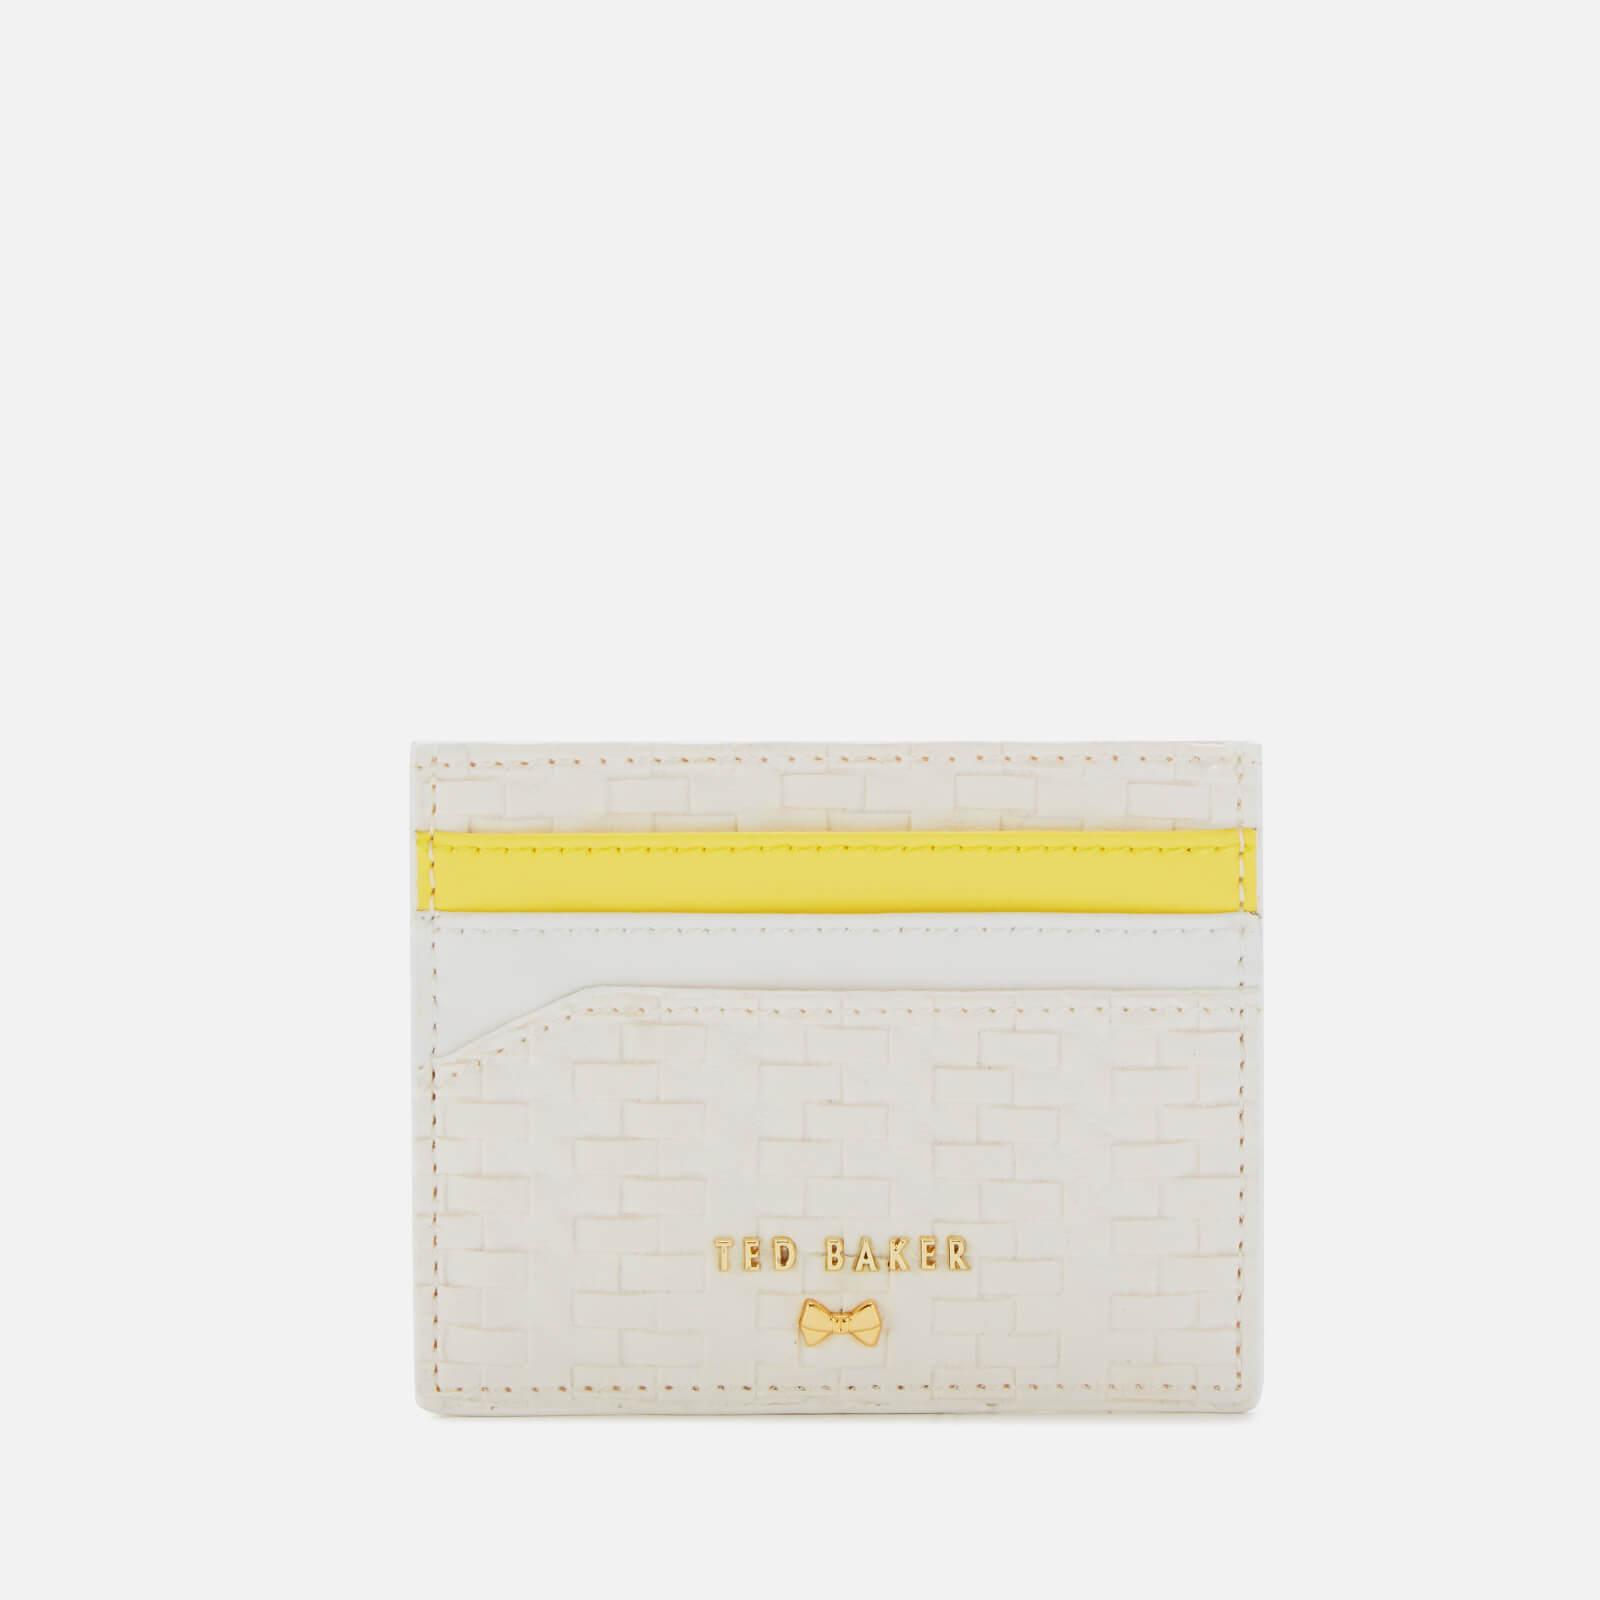 best service 1d2c7 0387f Ted Baker Women's Mabes Raffia Card Holder - White